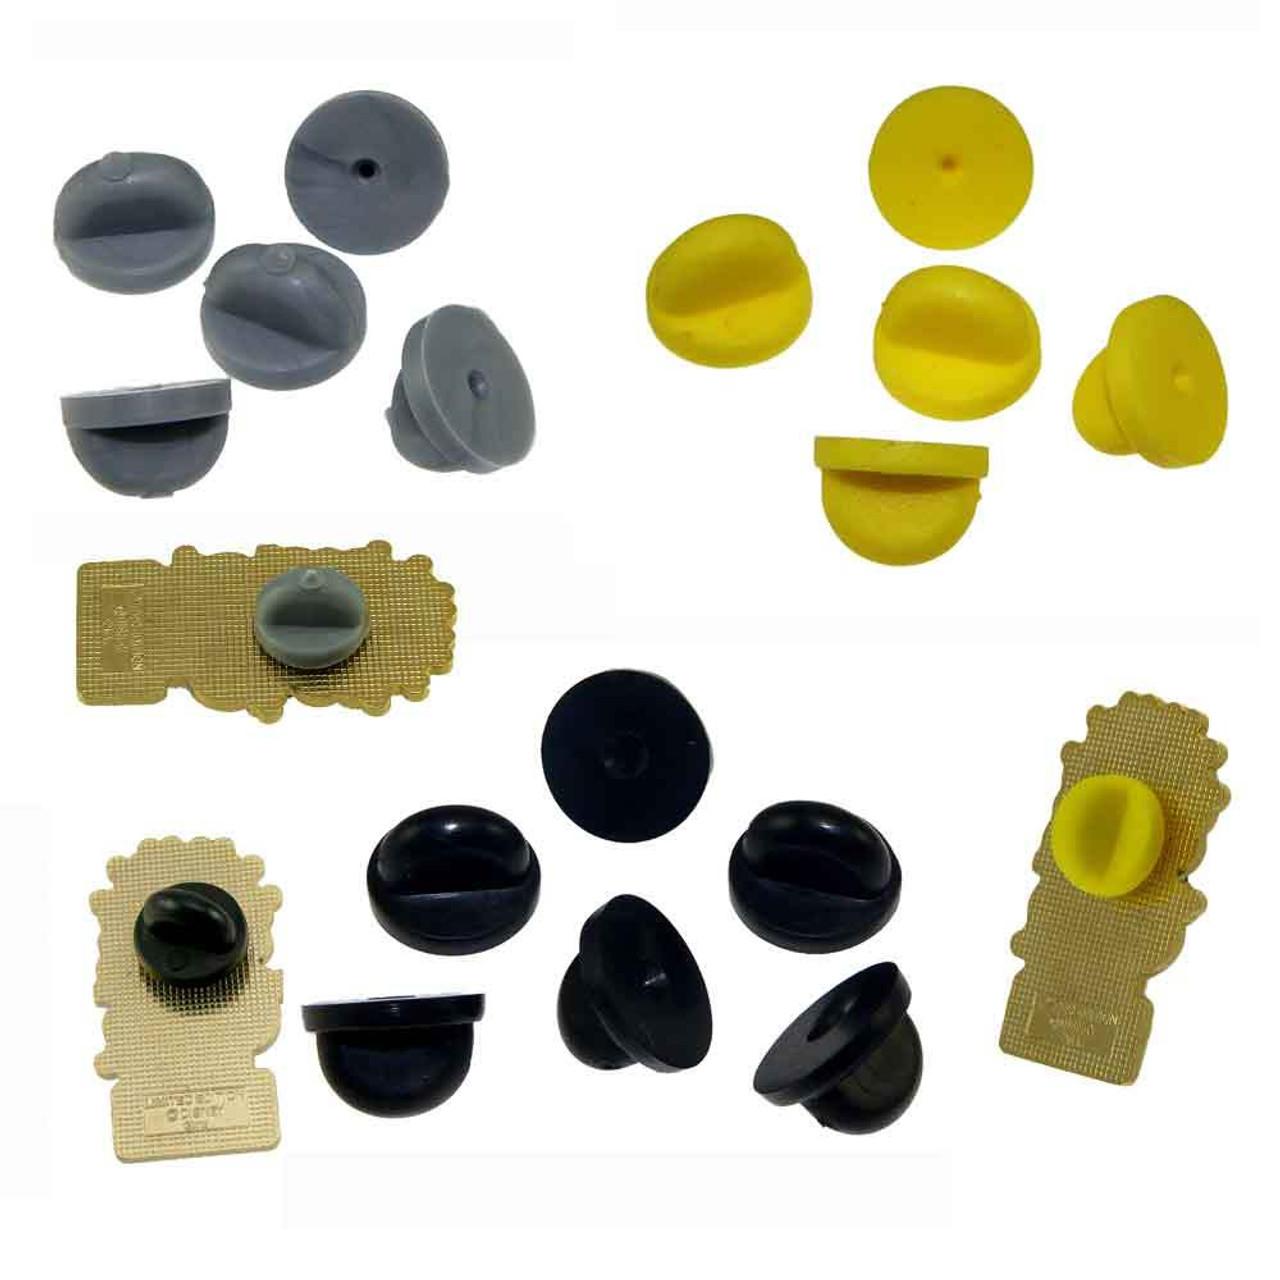 794bb1d48035 Black Yellow Gray Rummber Pin Backs | Lapel Pin Backs | Pin Back